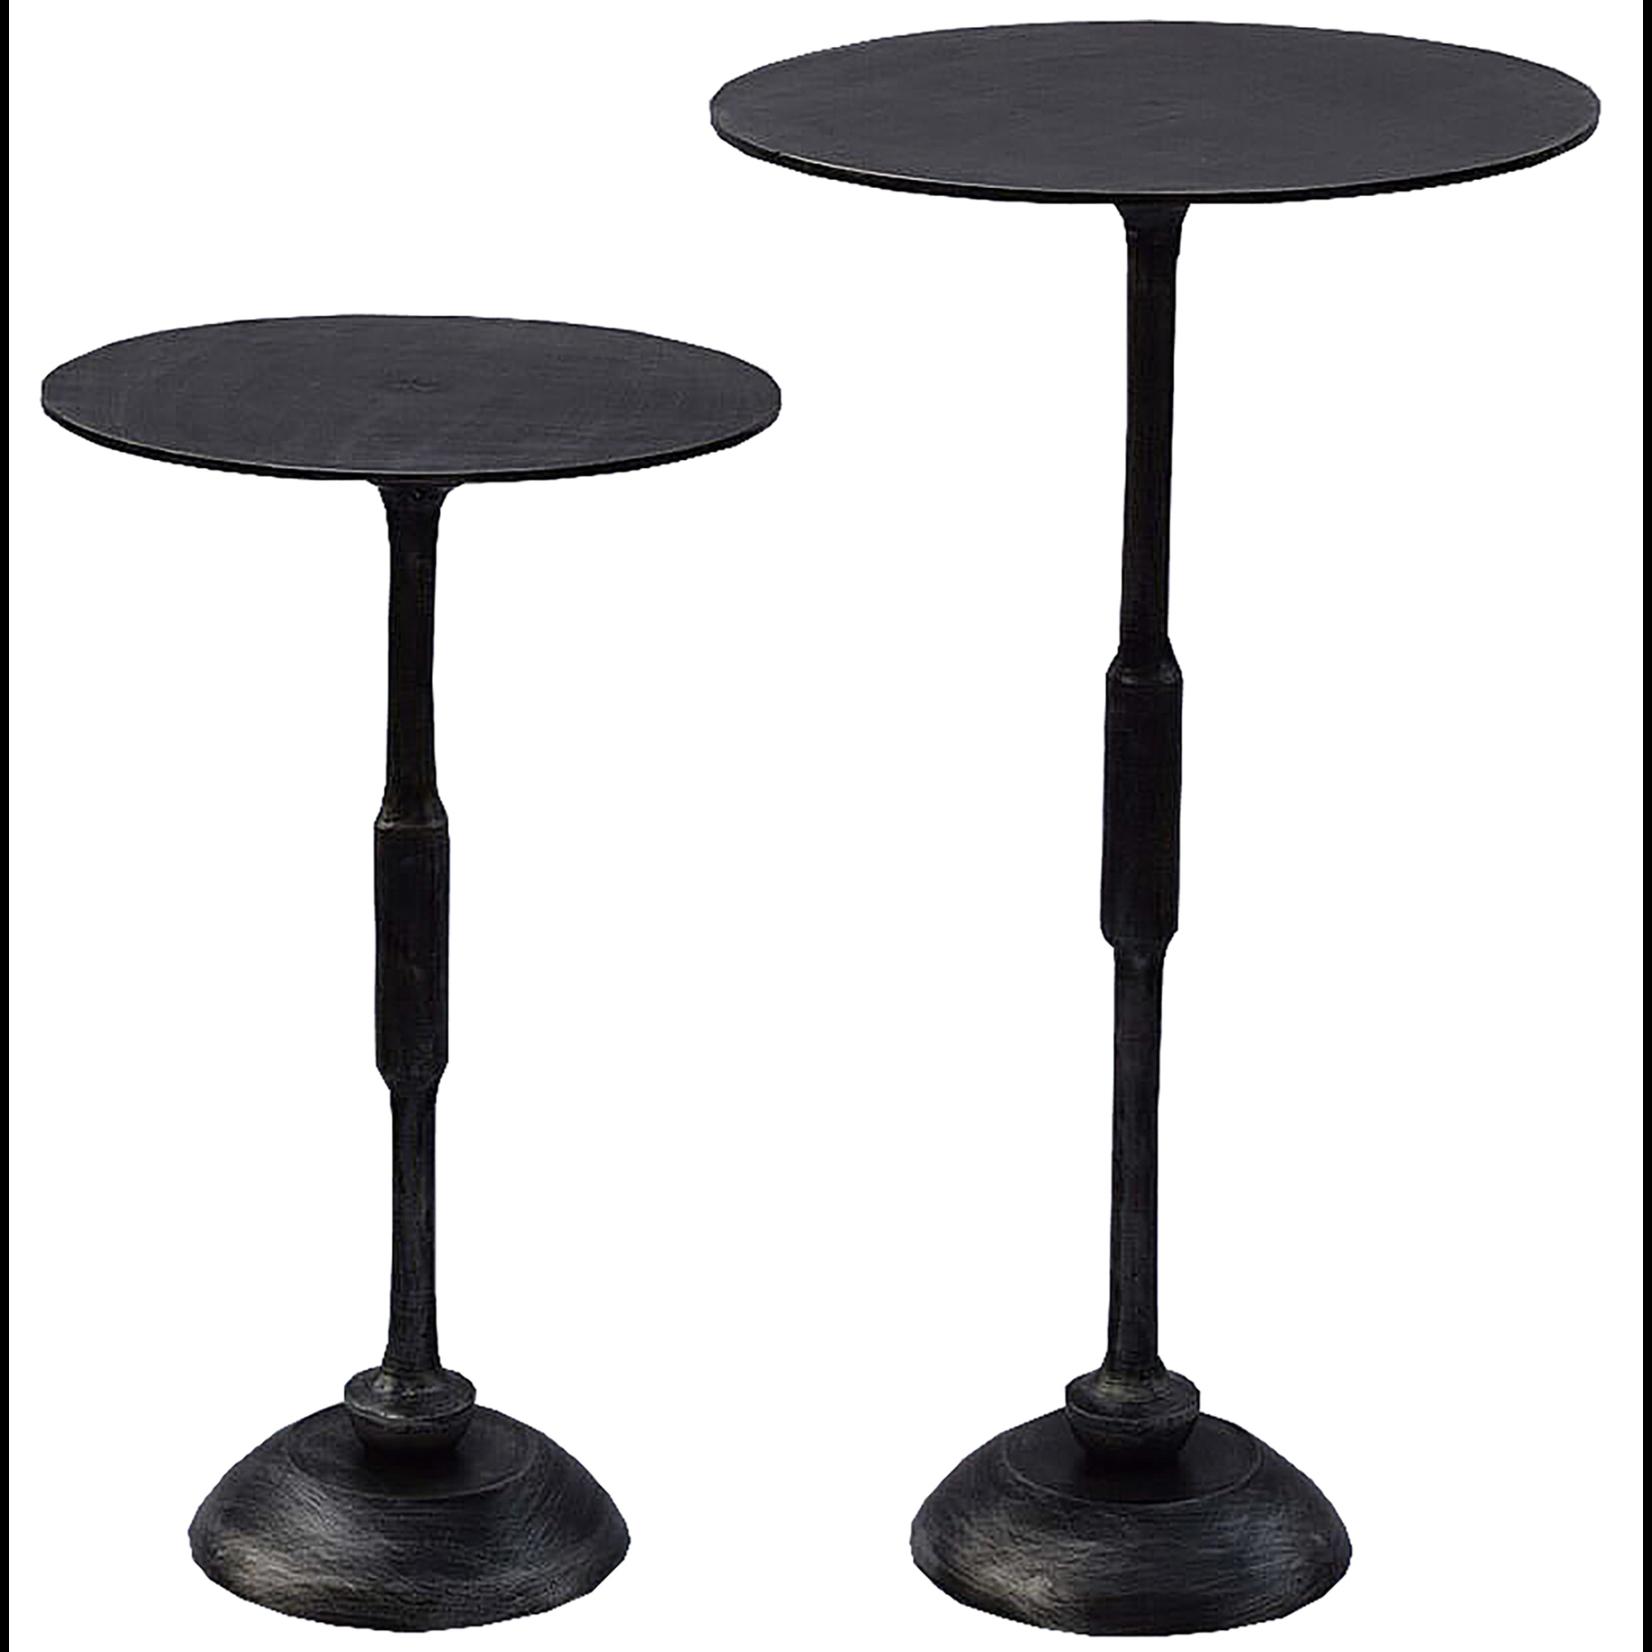 Bestin Side Tables Set of 2